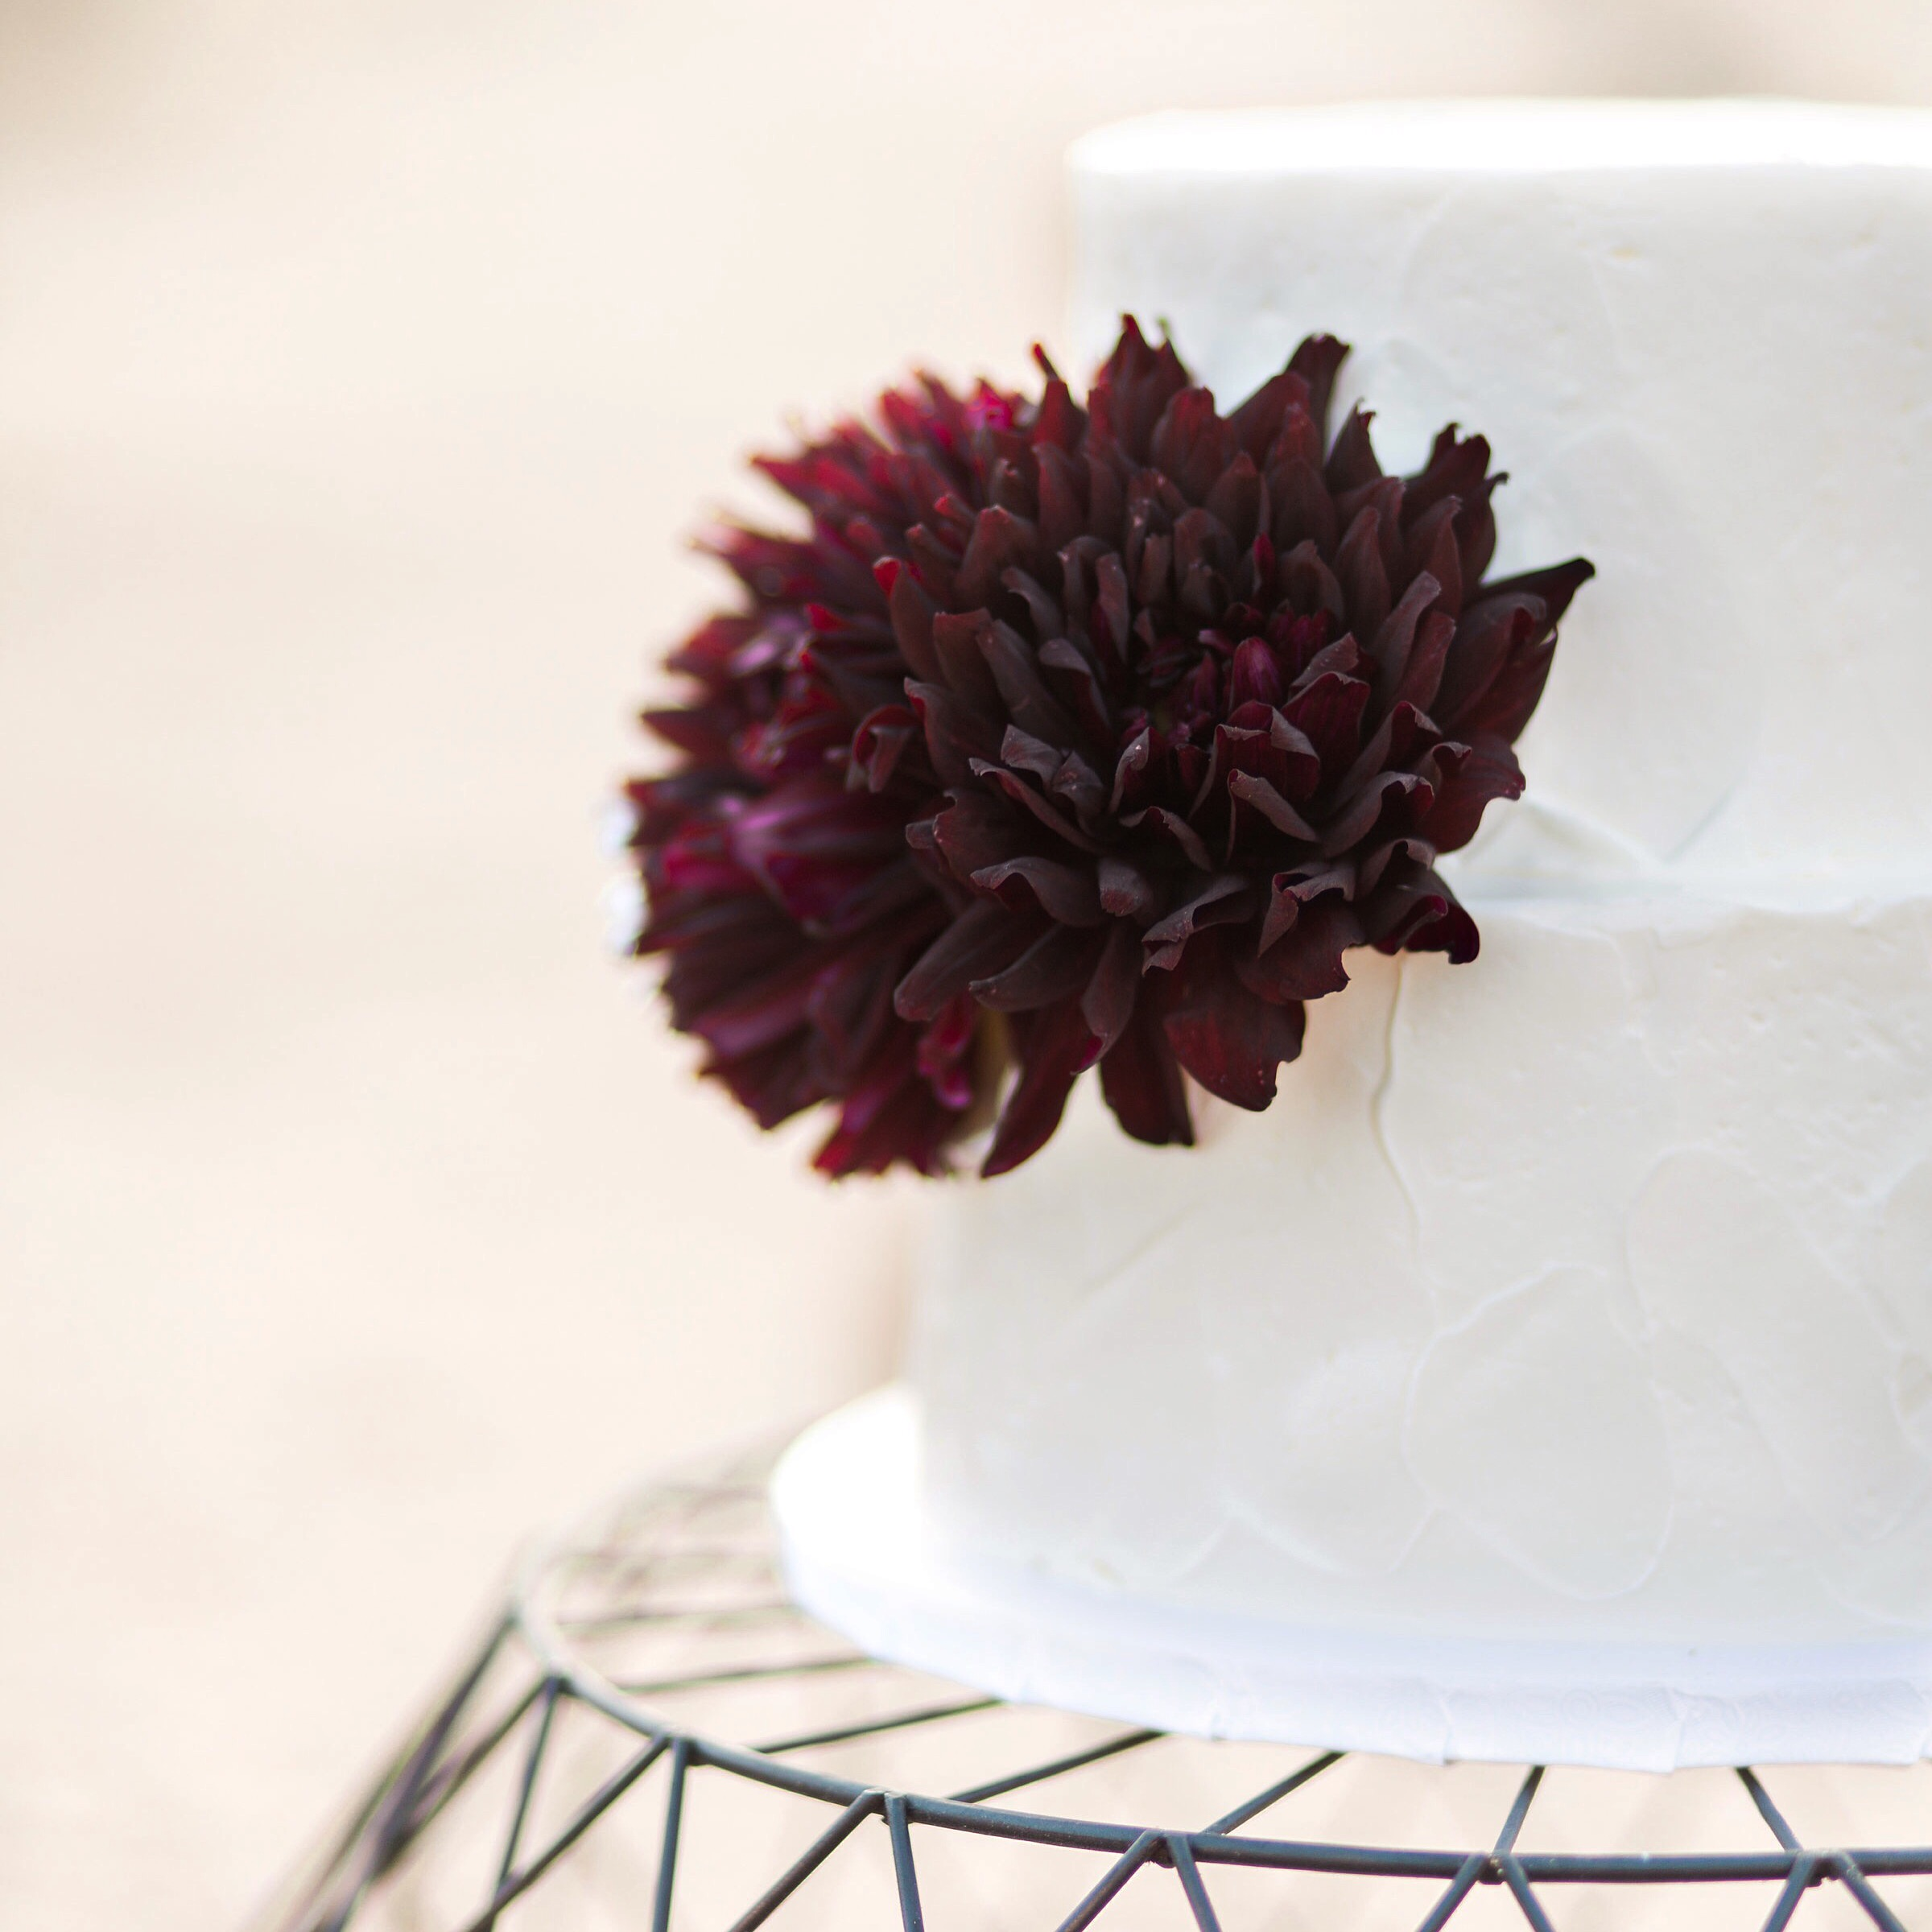 Pine & Sea Photography | desert photoshoot rustic buttercream cake